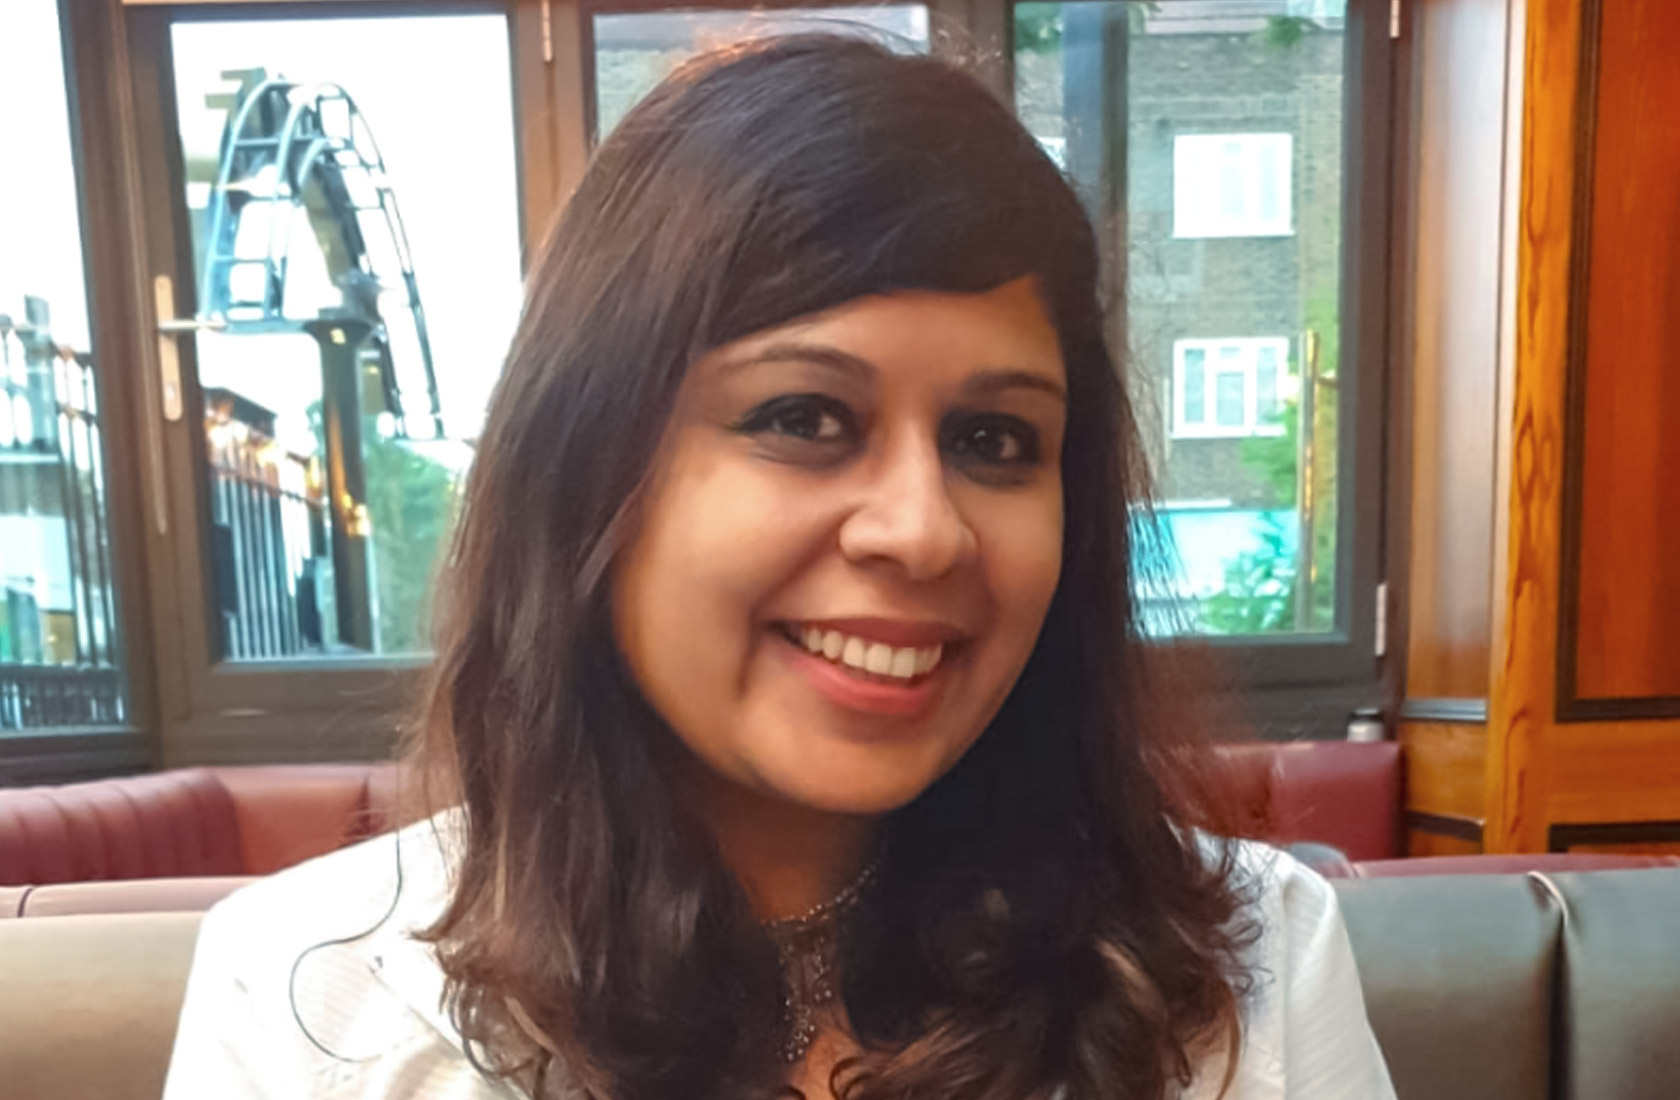 Encompass' Partnerships Director Tina Valand named in Innovate Finance Women in FinTech Powerlist 2020